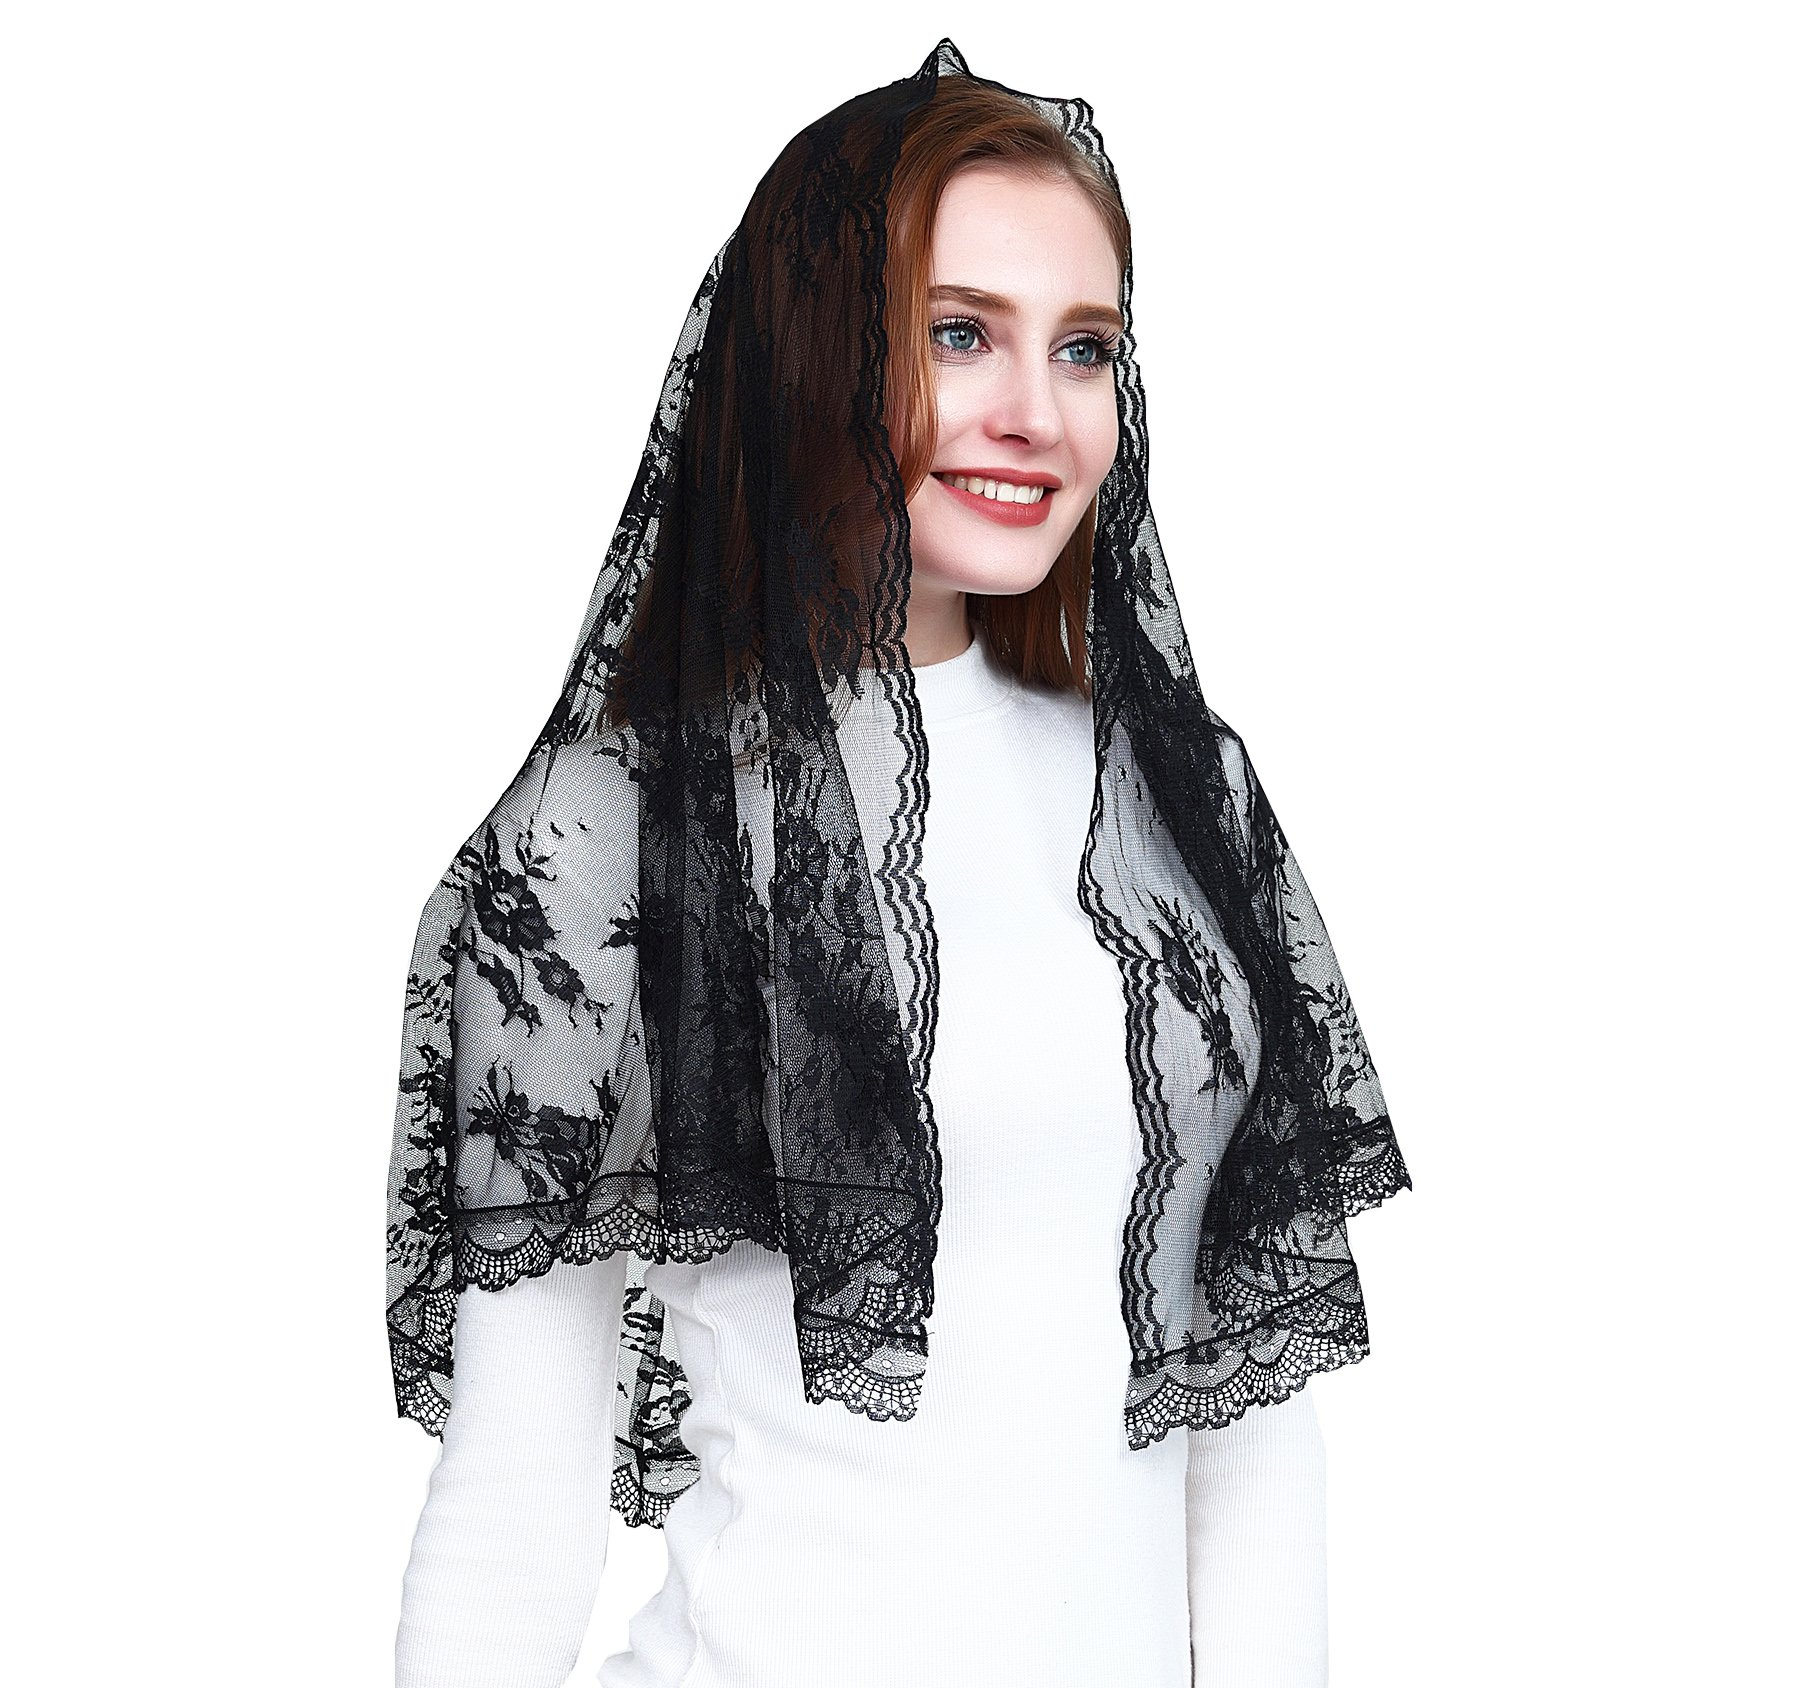 Catholic chapel veil infinity scarf mantilla floral black lace veil v42 (Veil)